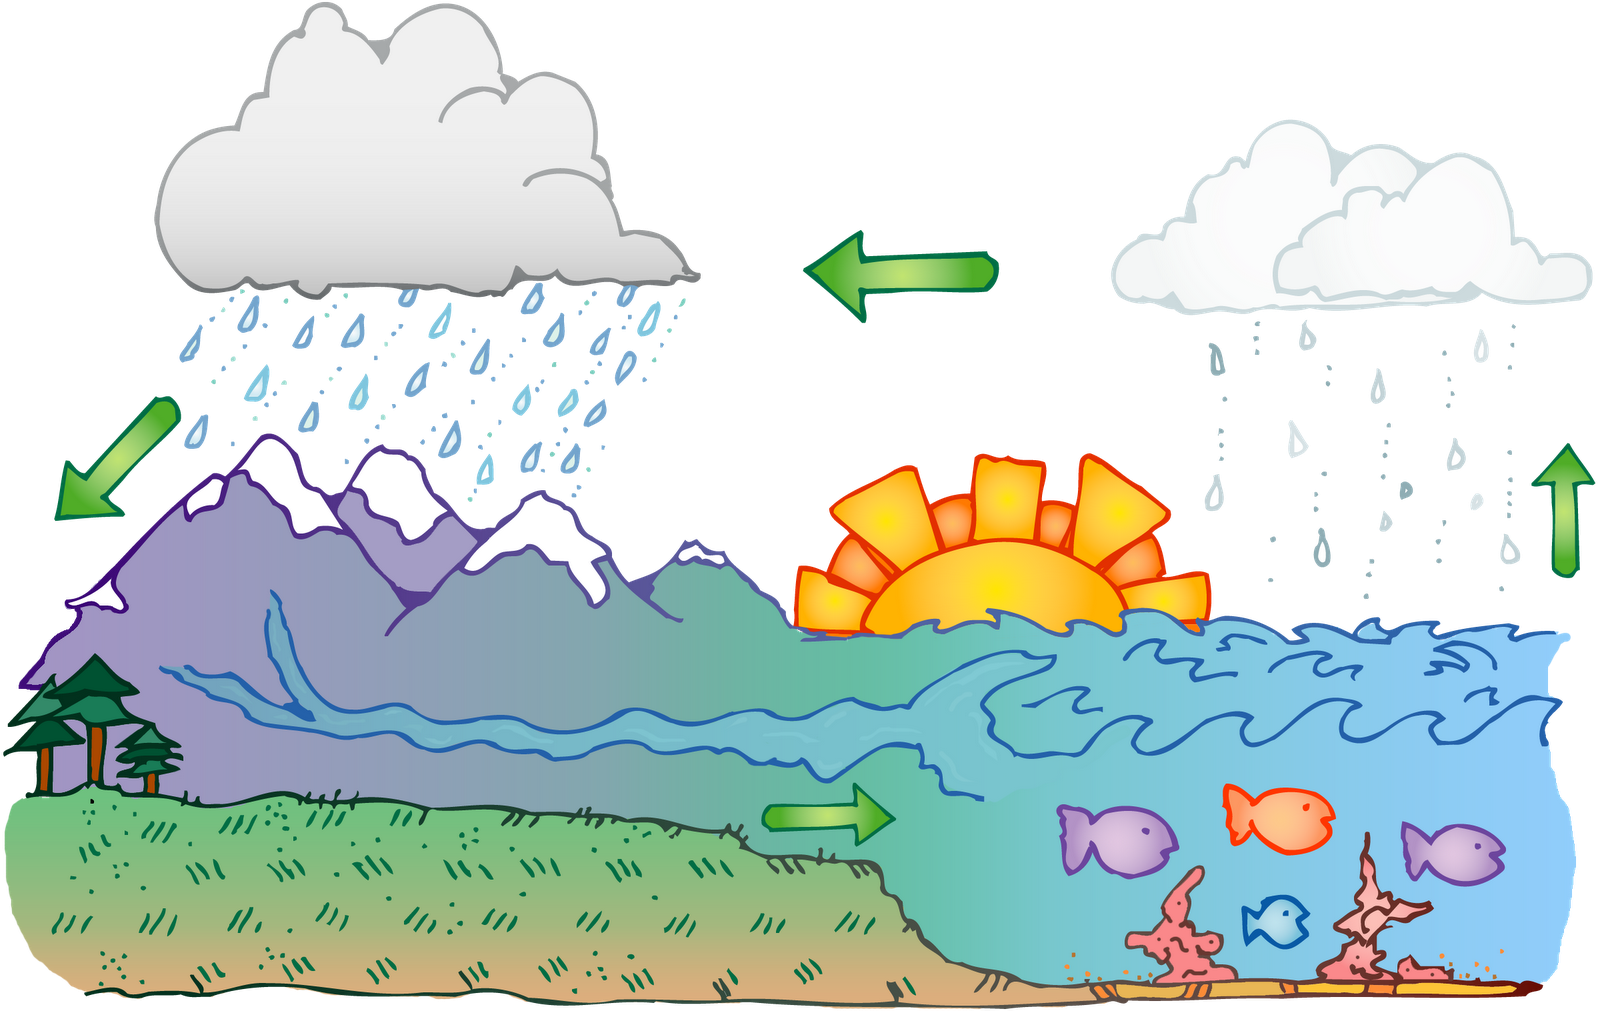 DJI_Earth_watercycle_c.png (1600×1011)   Water cycle ...